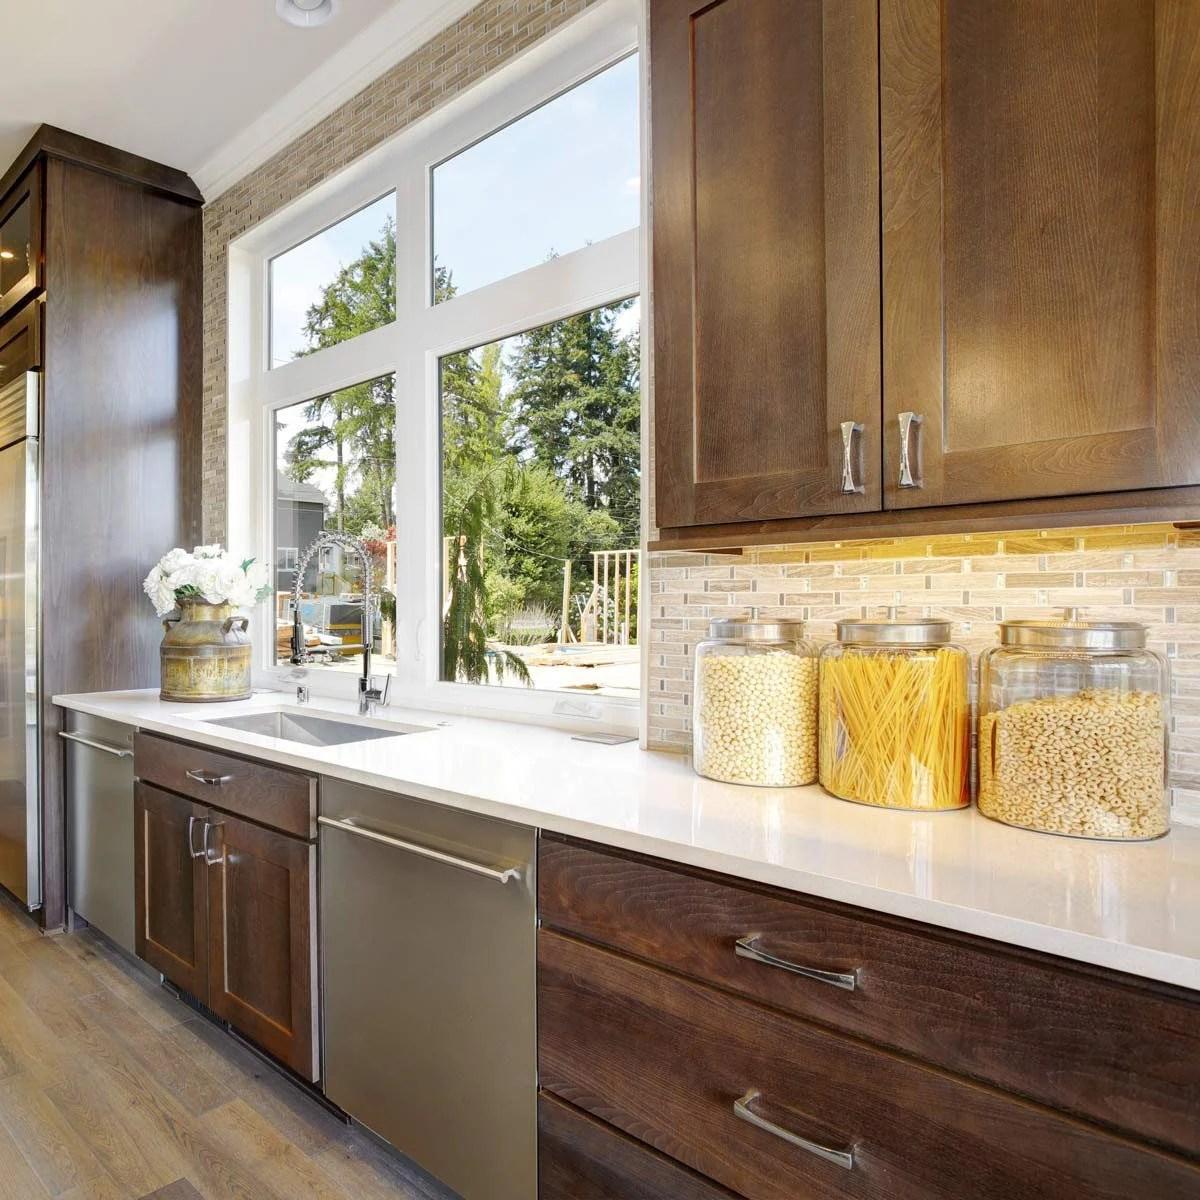 Best Kitchen Backsplash Ideas For Dark Cabinets | Family ... on Backsplash Ideas For Dark Cabinets And Light Countertops  id=75581